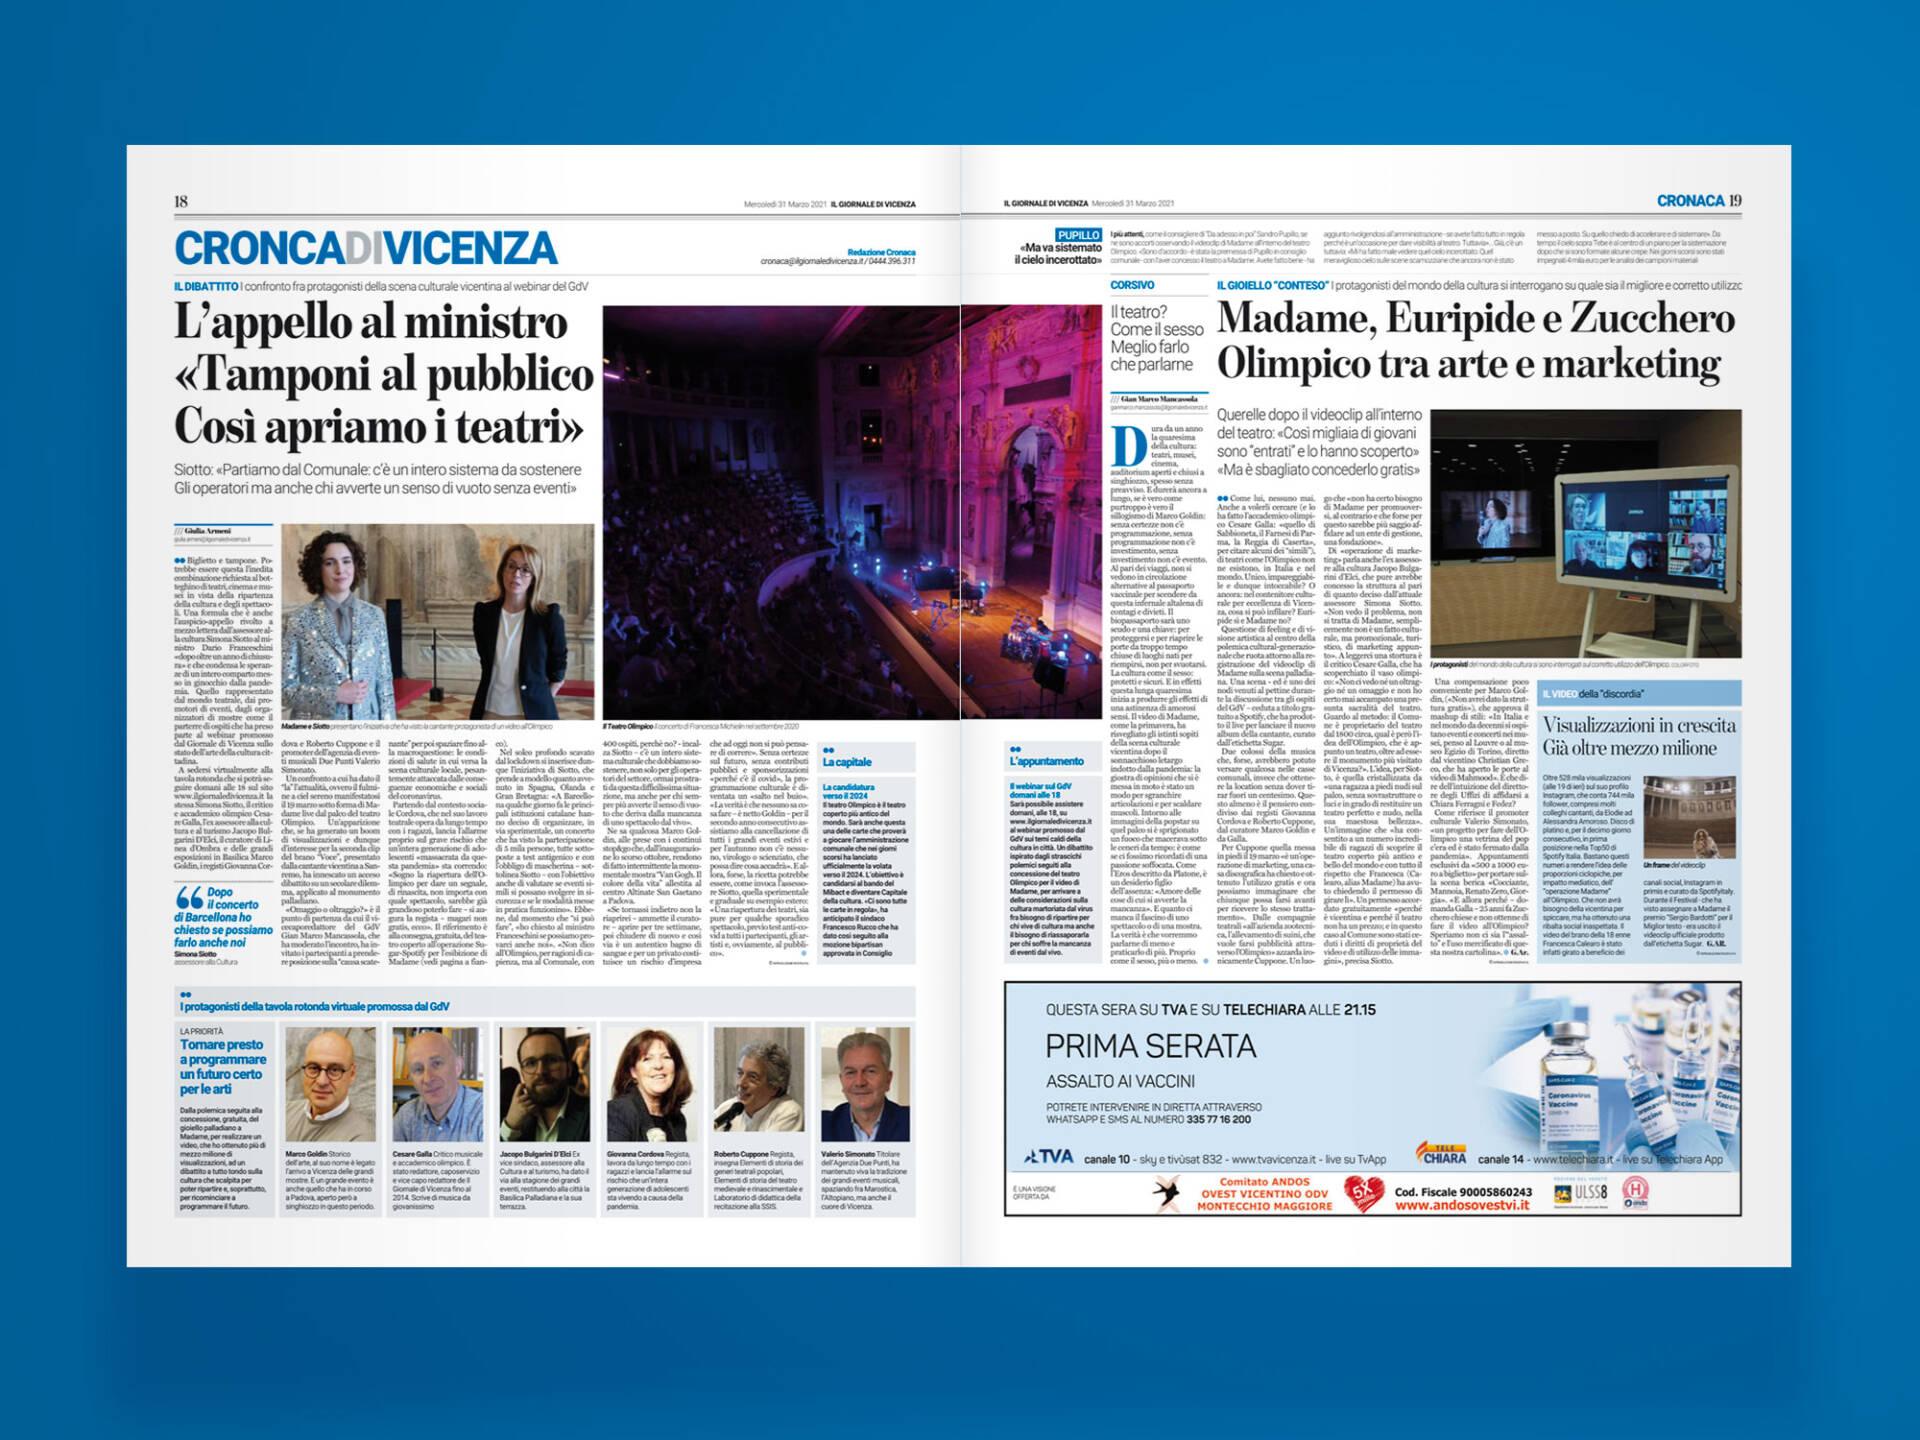 Il-Gionrale-Di-Vicenza-04-Wenceslau-News-Design-2021